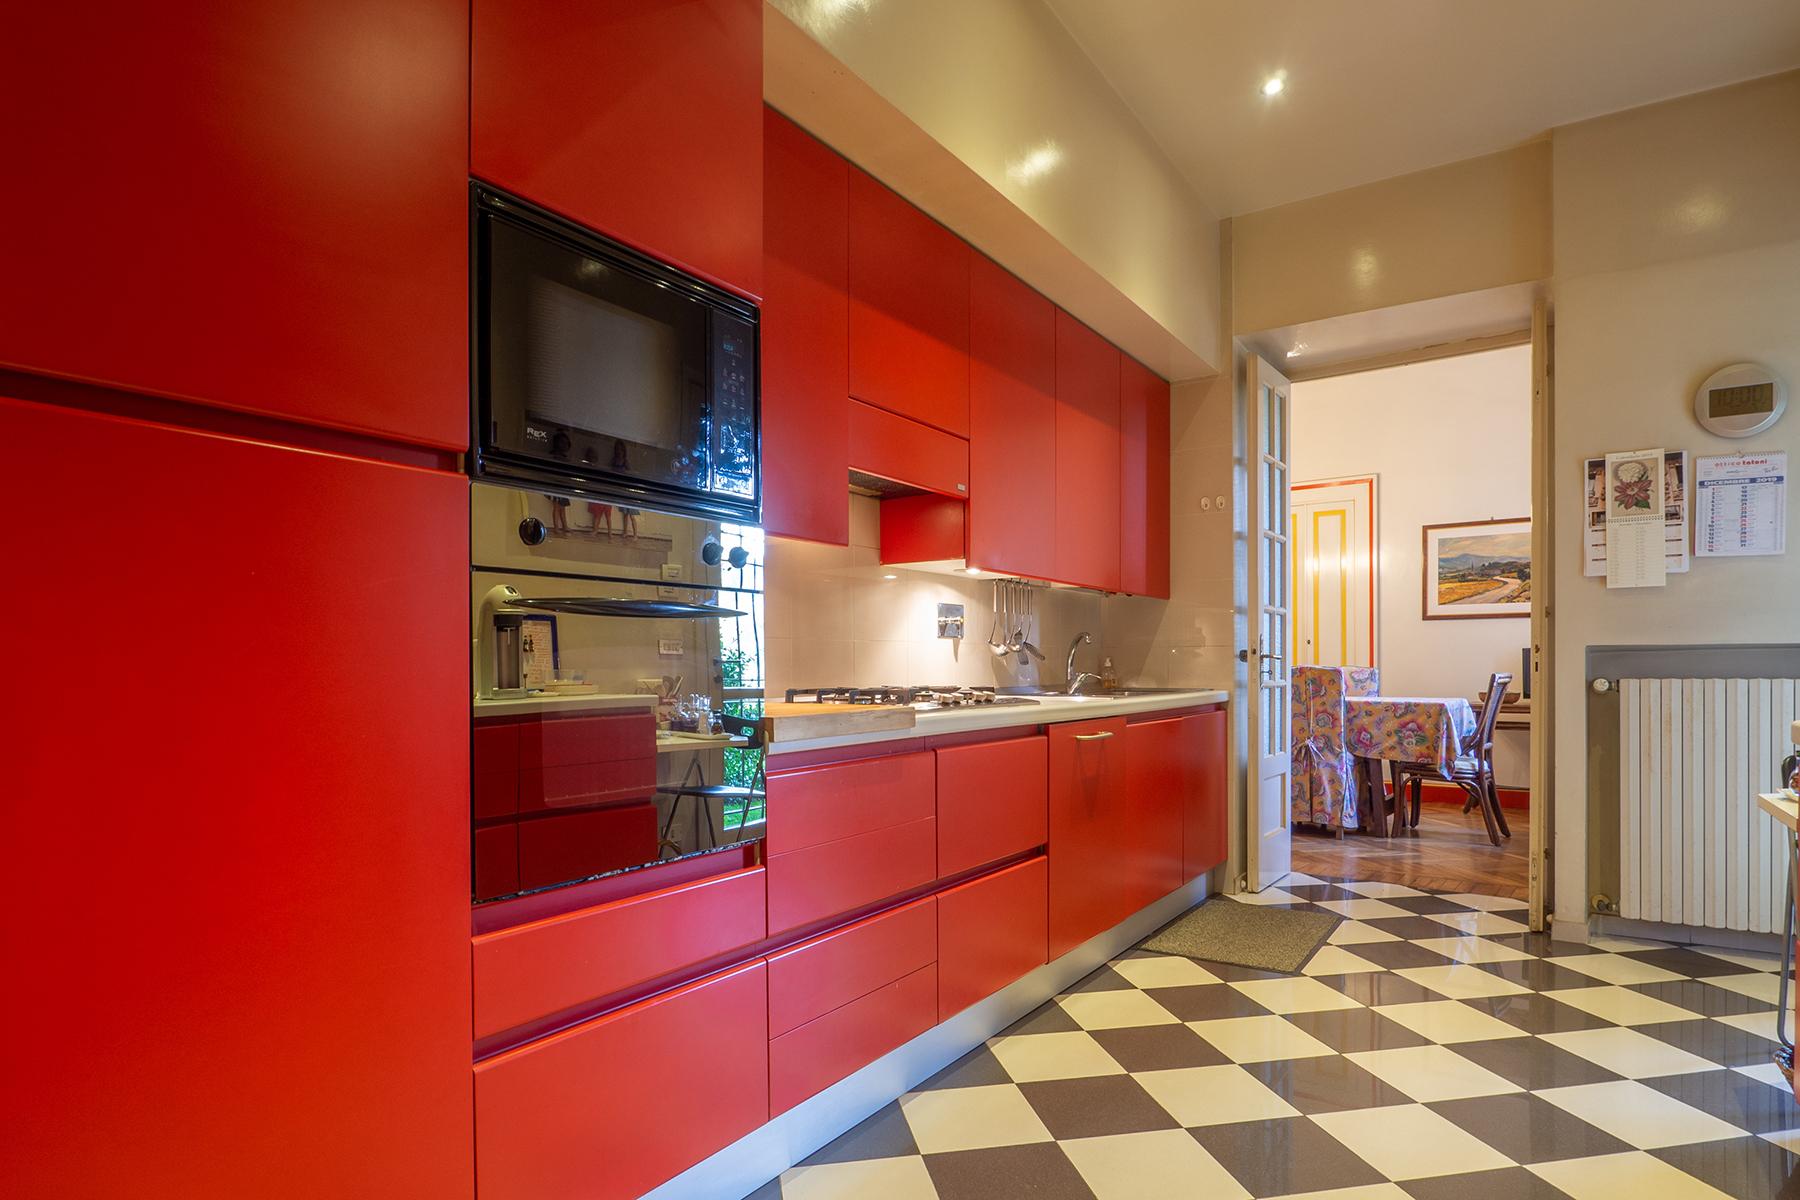 Casa indipendente in Vendita a Torino: 5 locali, 657 mq - Foto 10